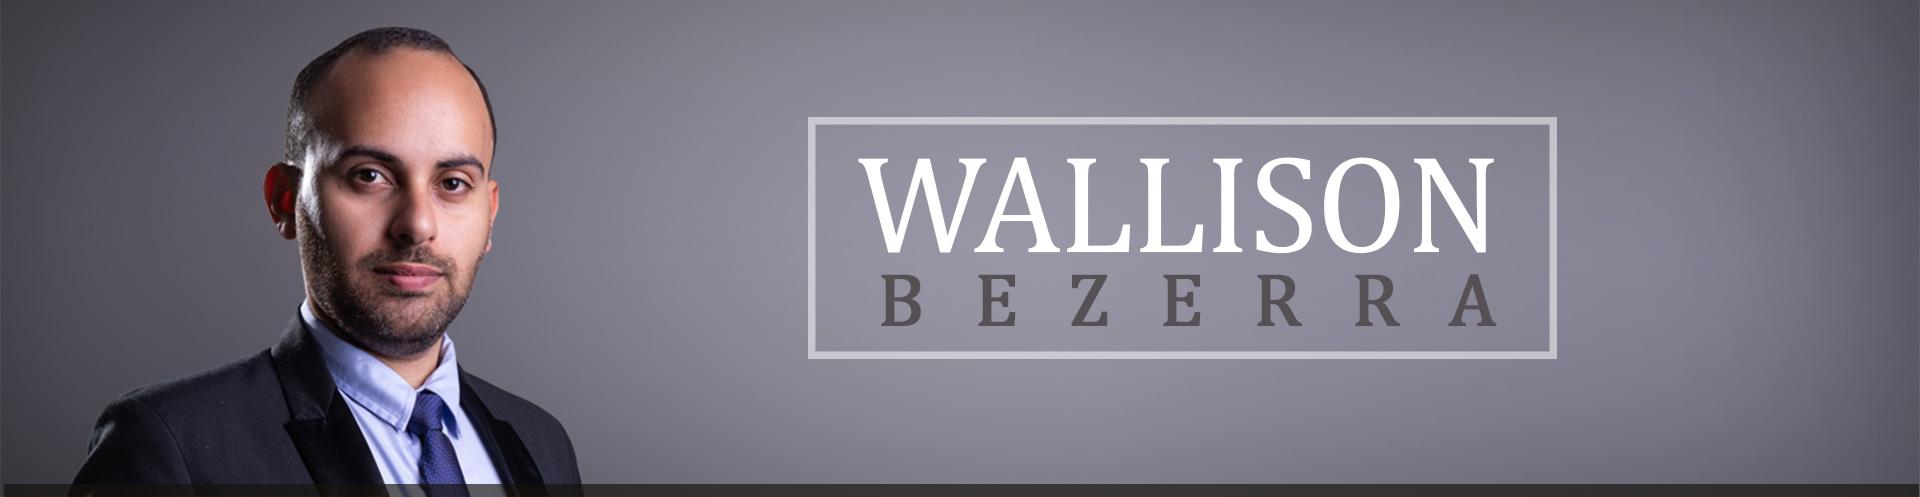 Wallison Bezerra